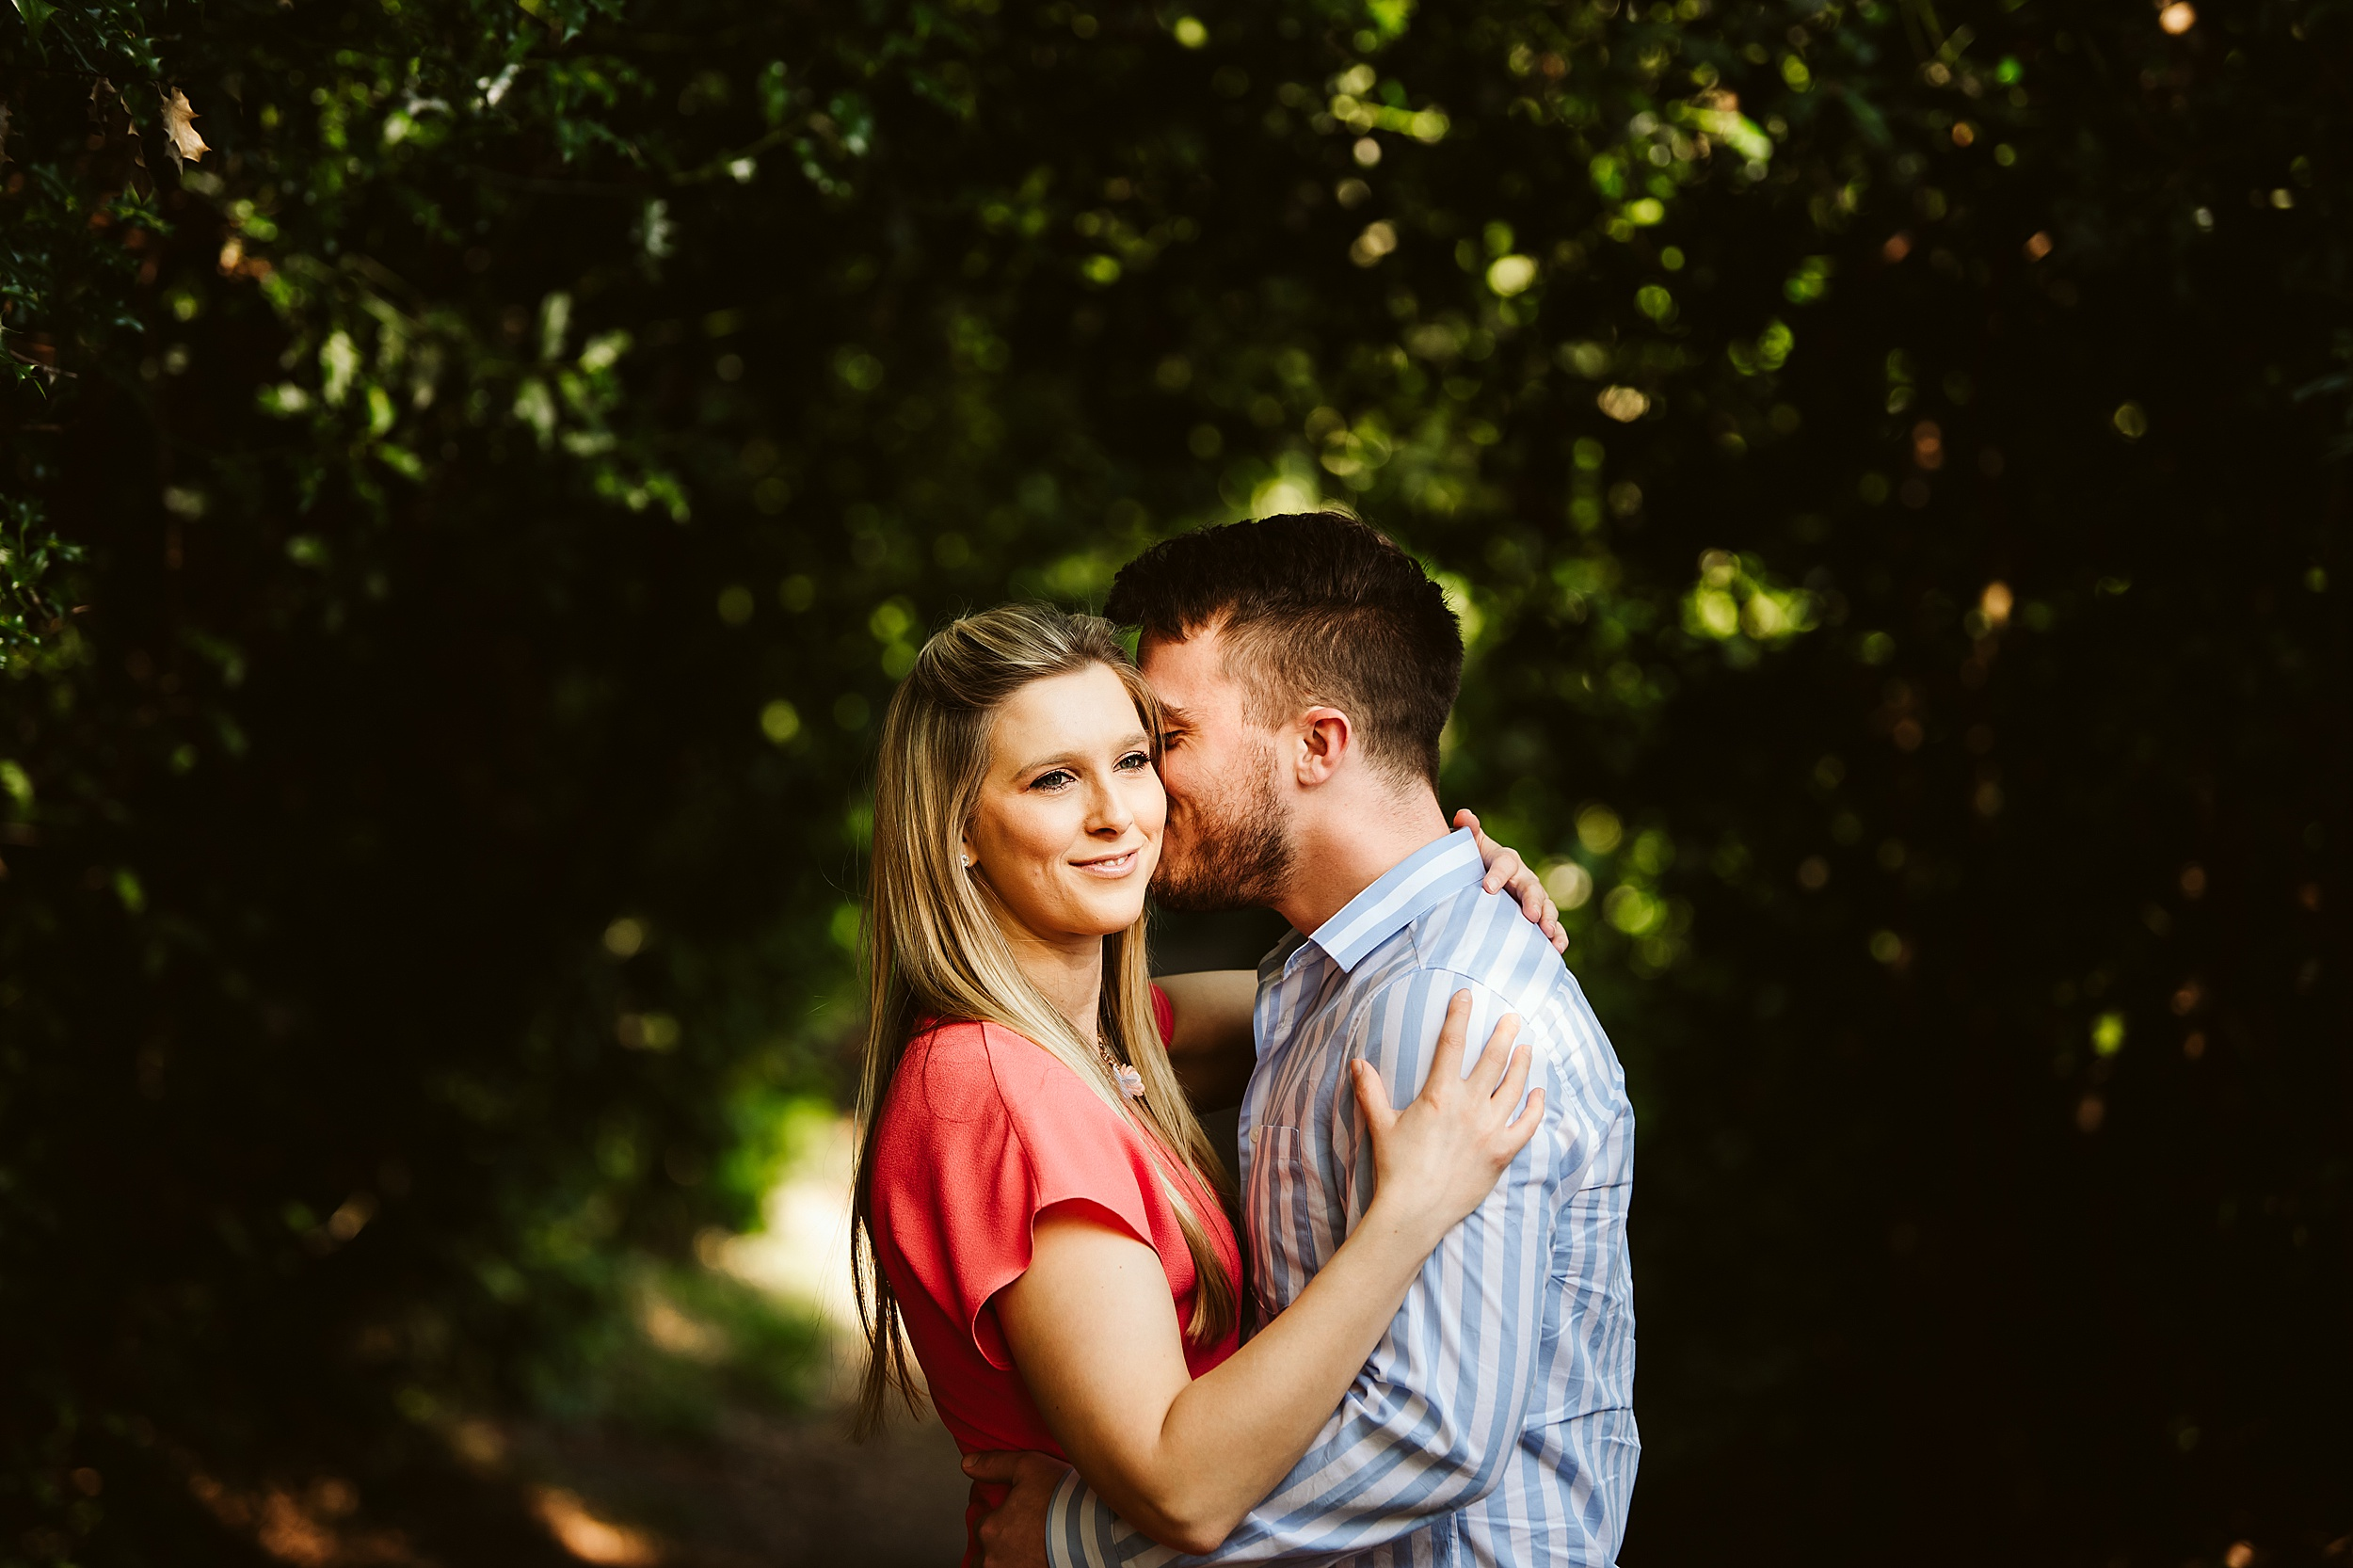 Toronto_Wedding_Photographer_UK_Destination_Engagement_Shoot_0002.jpg